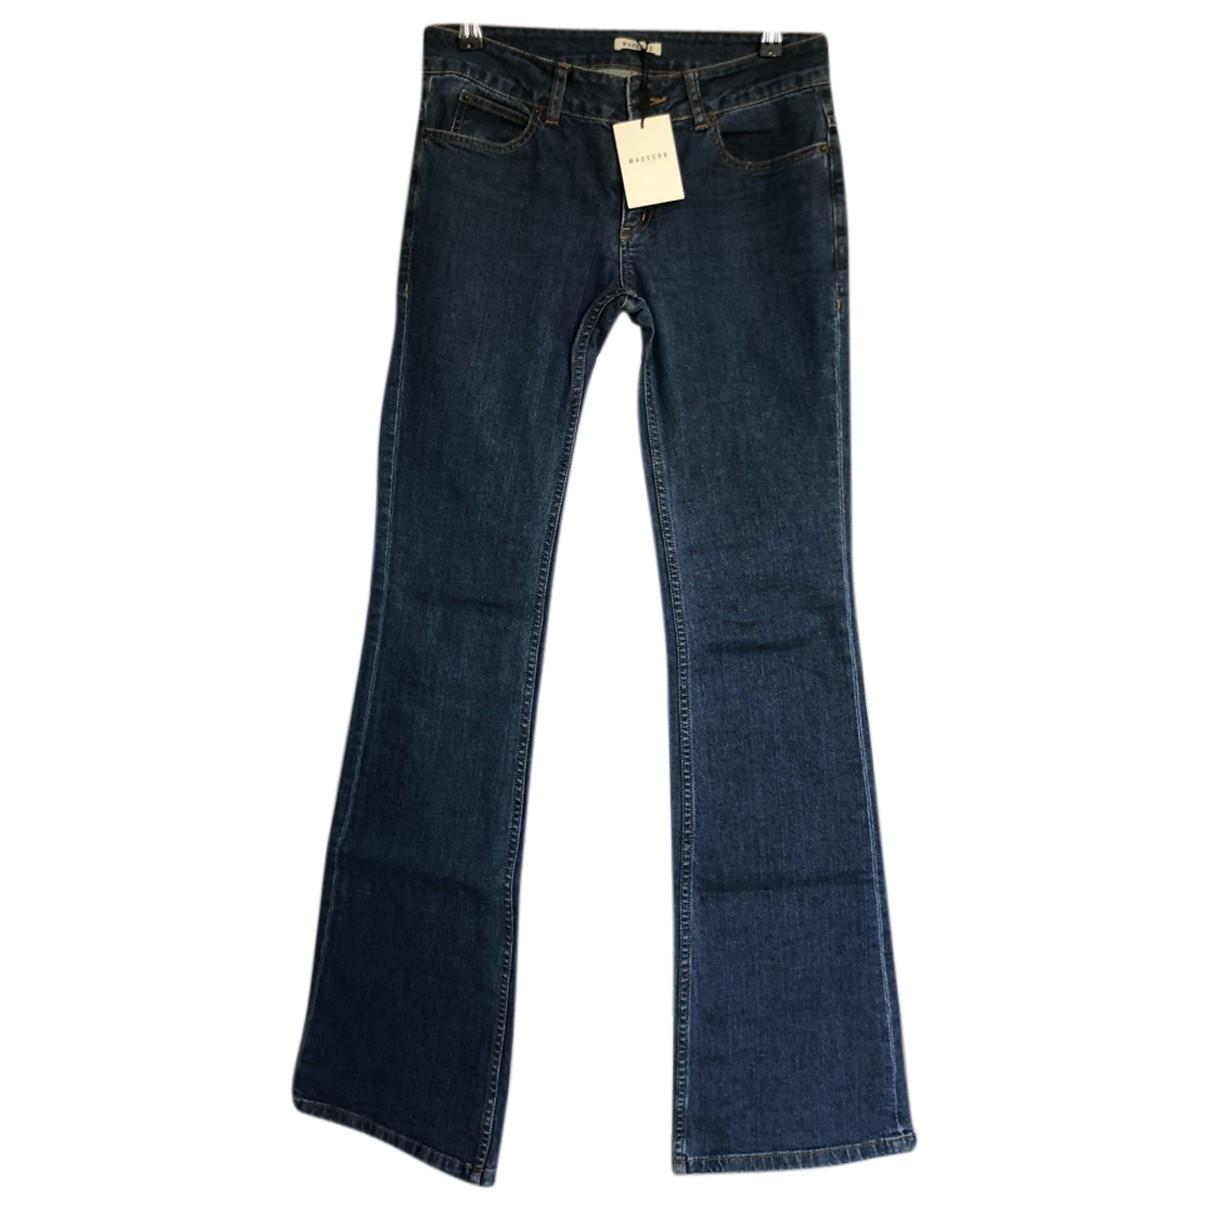 Masscob \N Blue Denim - Jeans Jeans for Women 34 FR